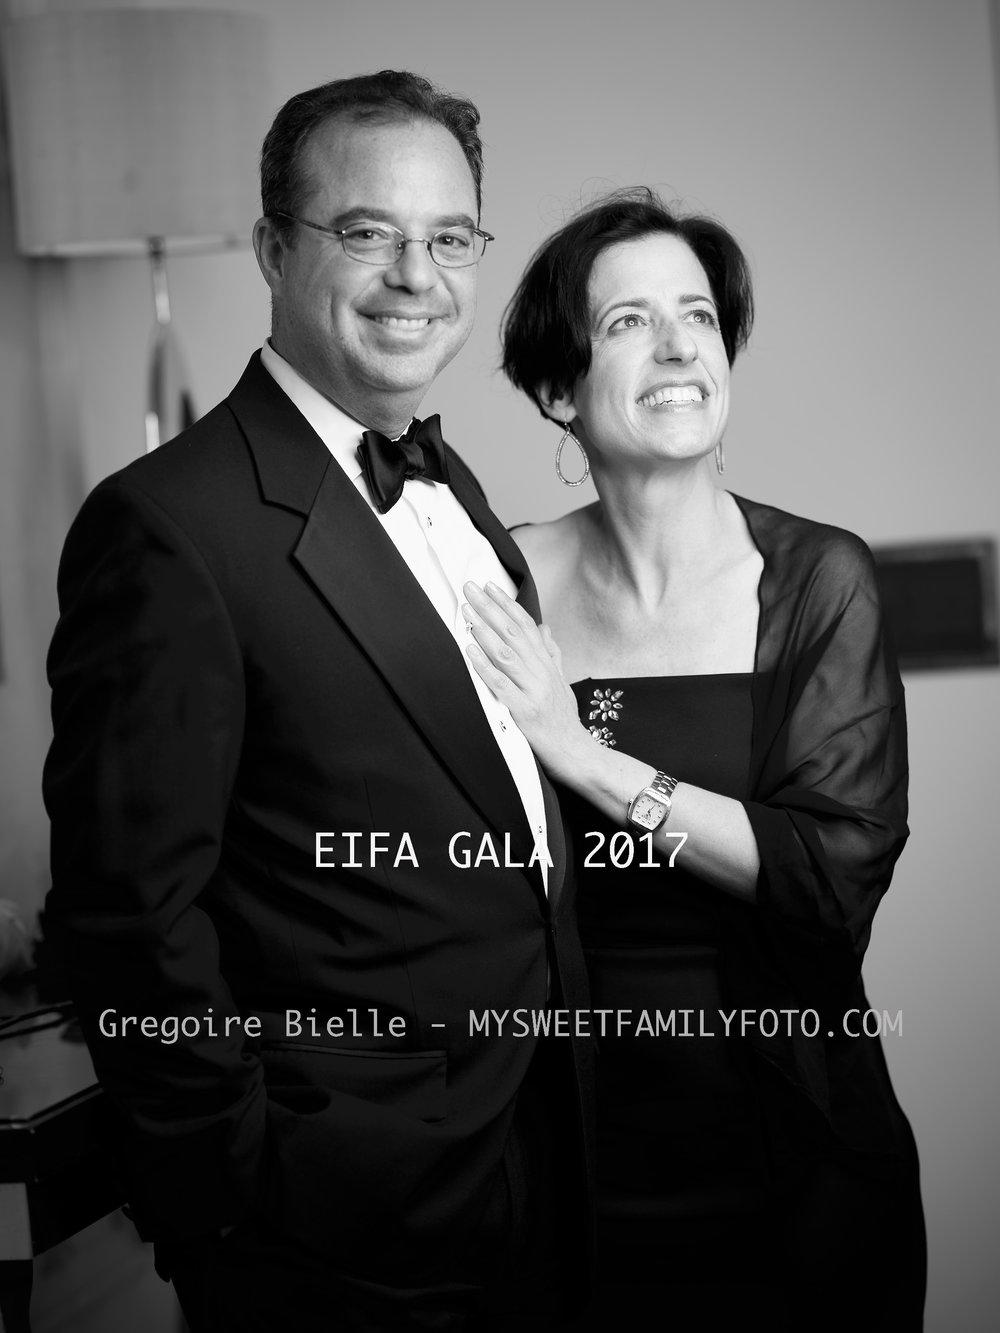 EIFA GALA 1268.jpg